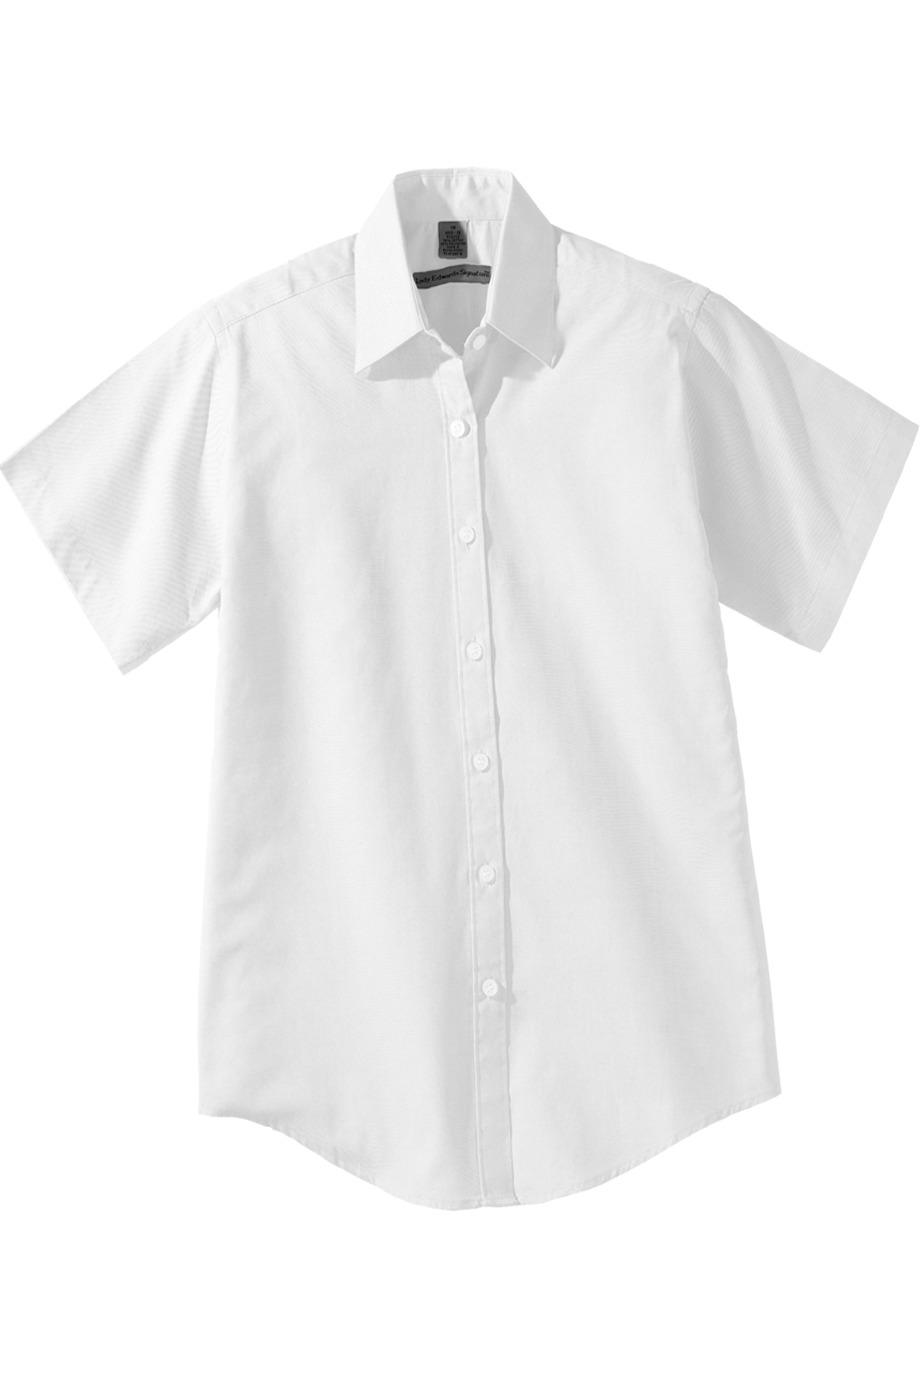 Edwards Garment 5925 - Women's Short Sleeve Pinpoint ...